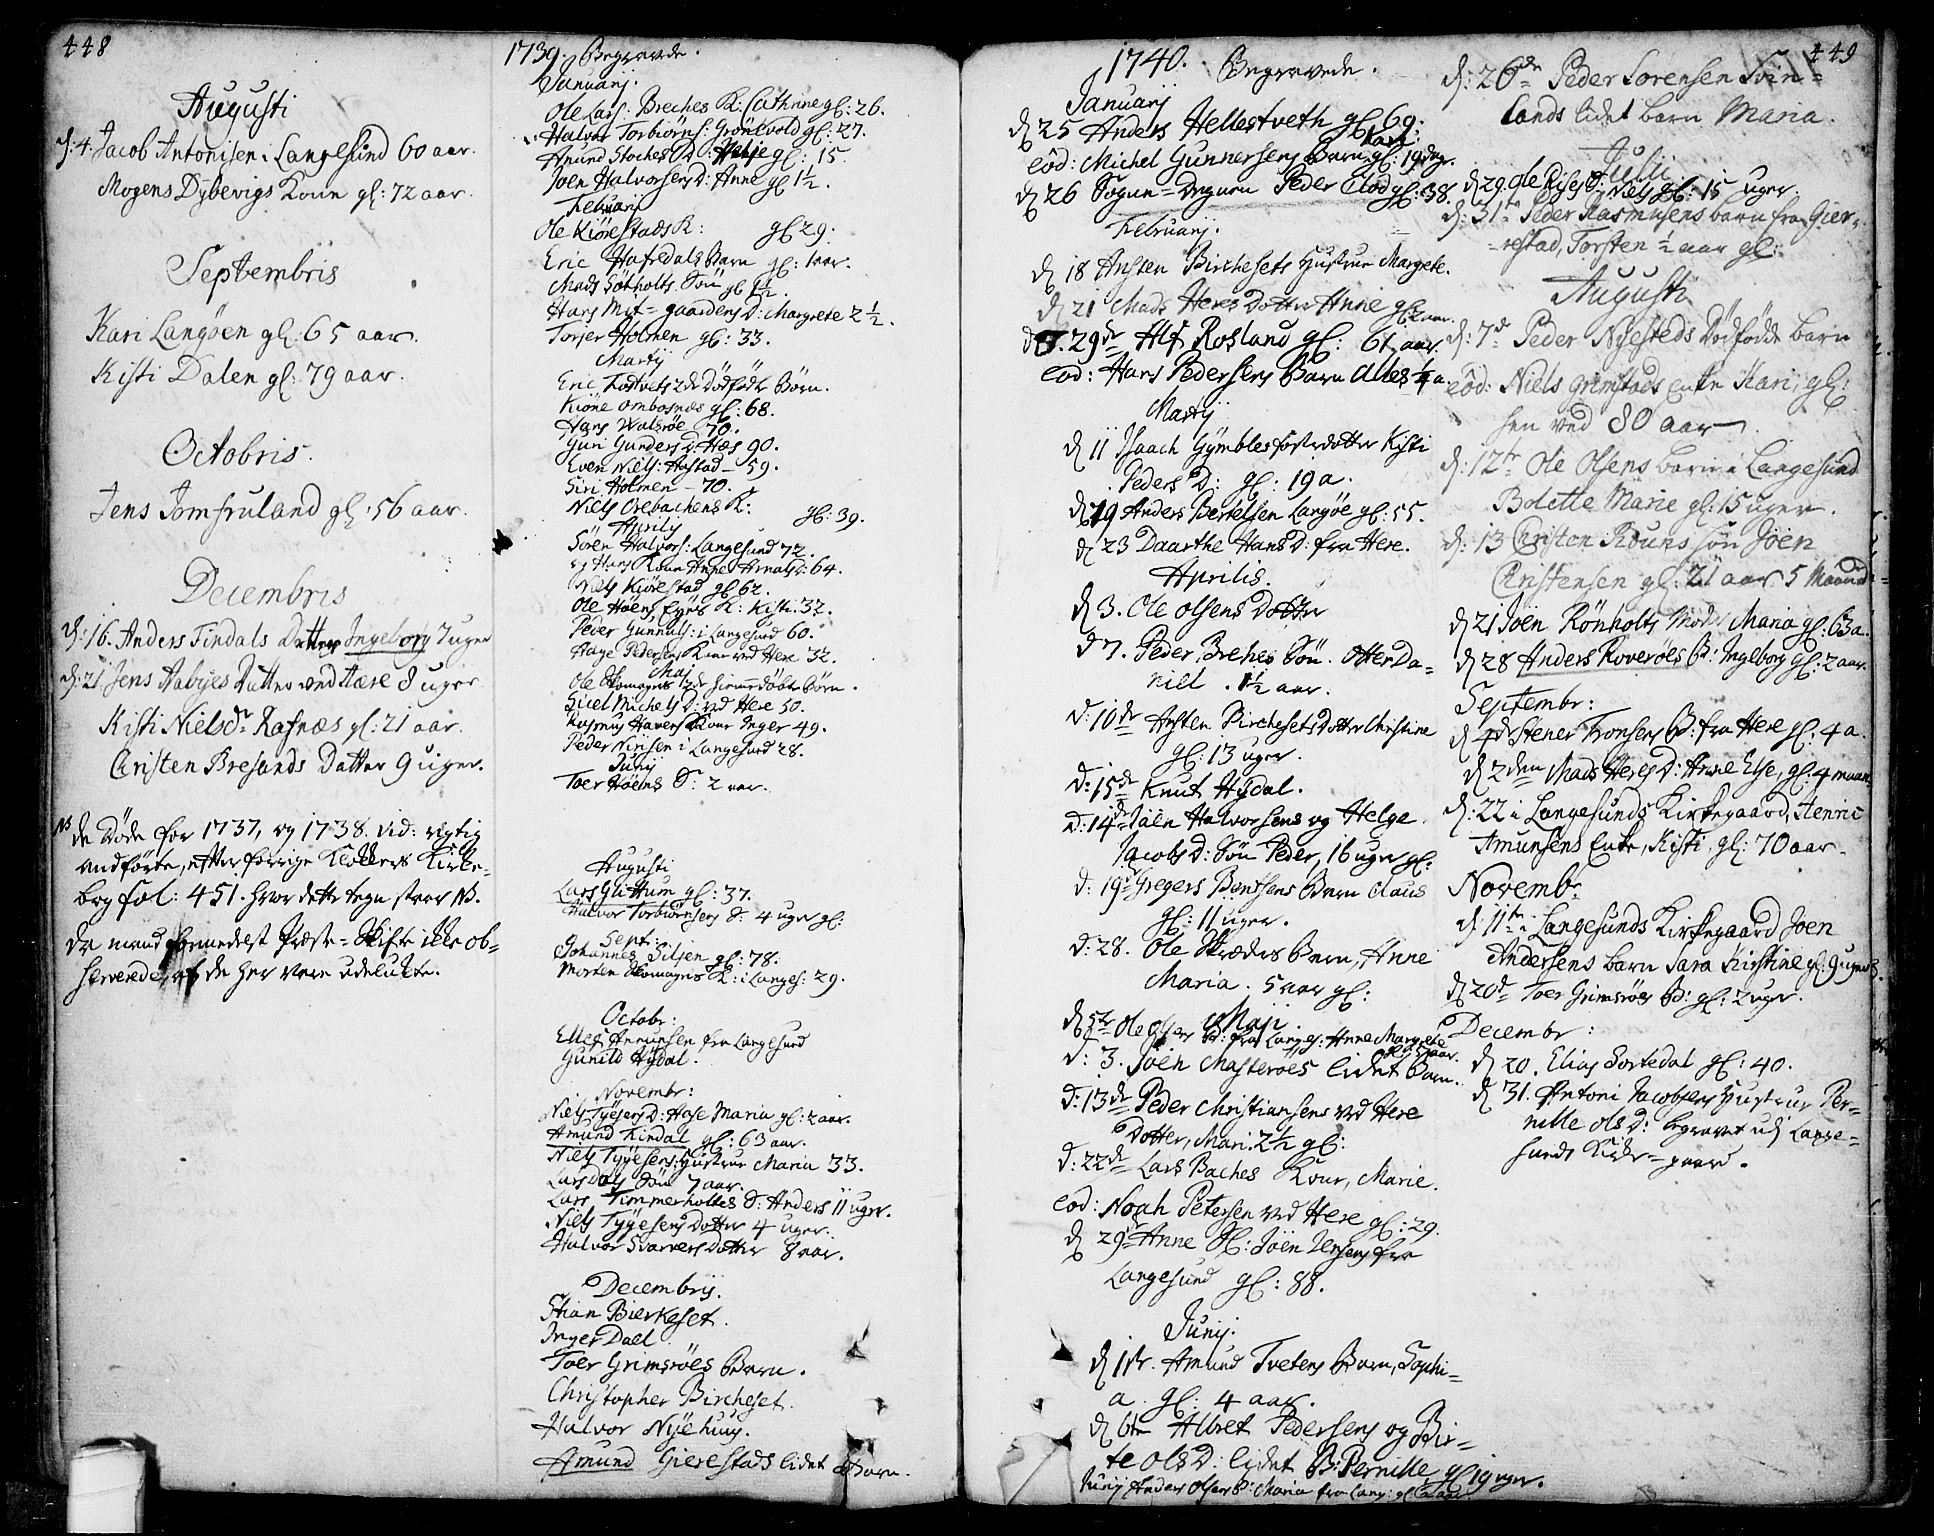 SAKO, Bamble kirkebøker, F/Fa/L0001: Ministerialbok nr. I 1, 1702-1774, s. 448-449